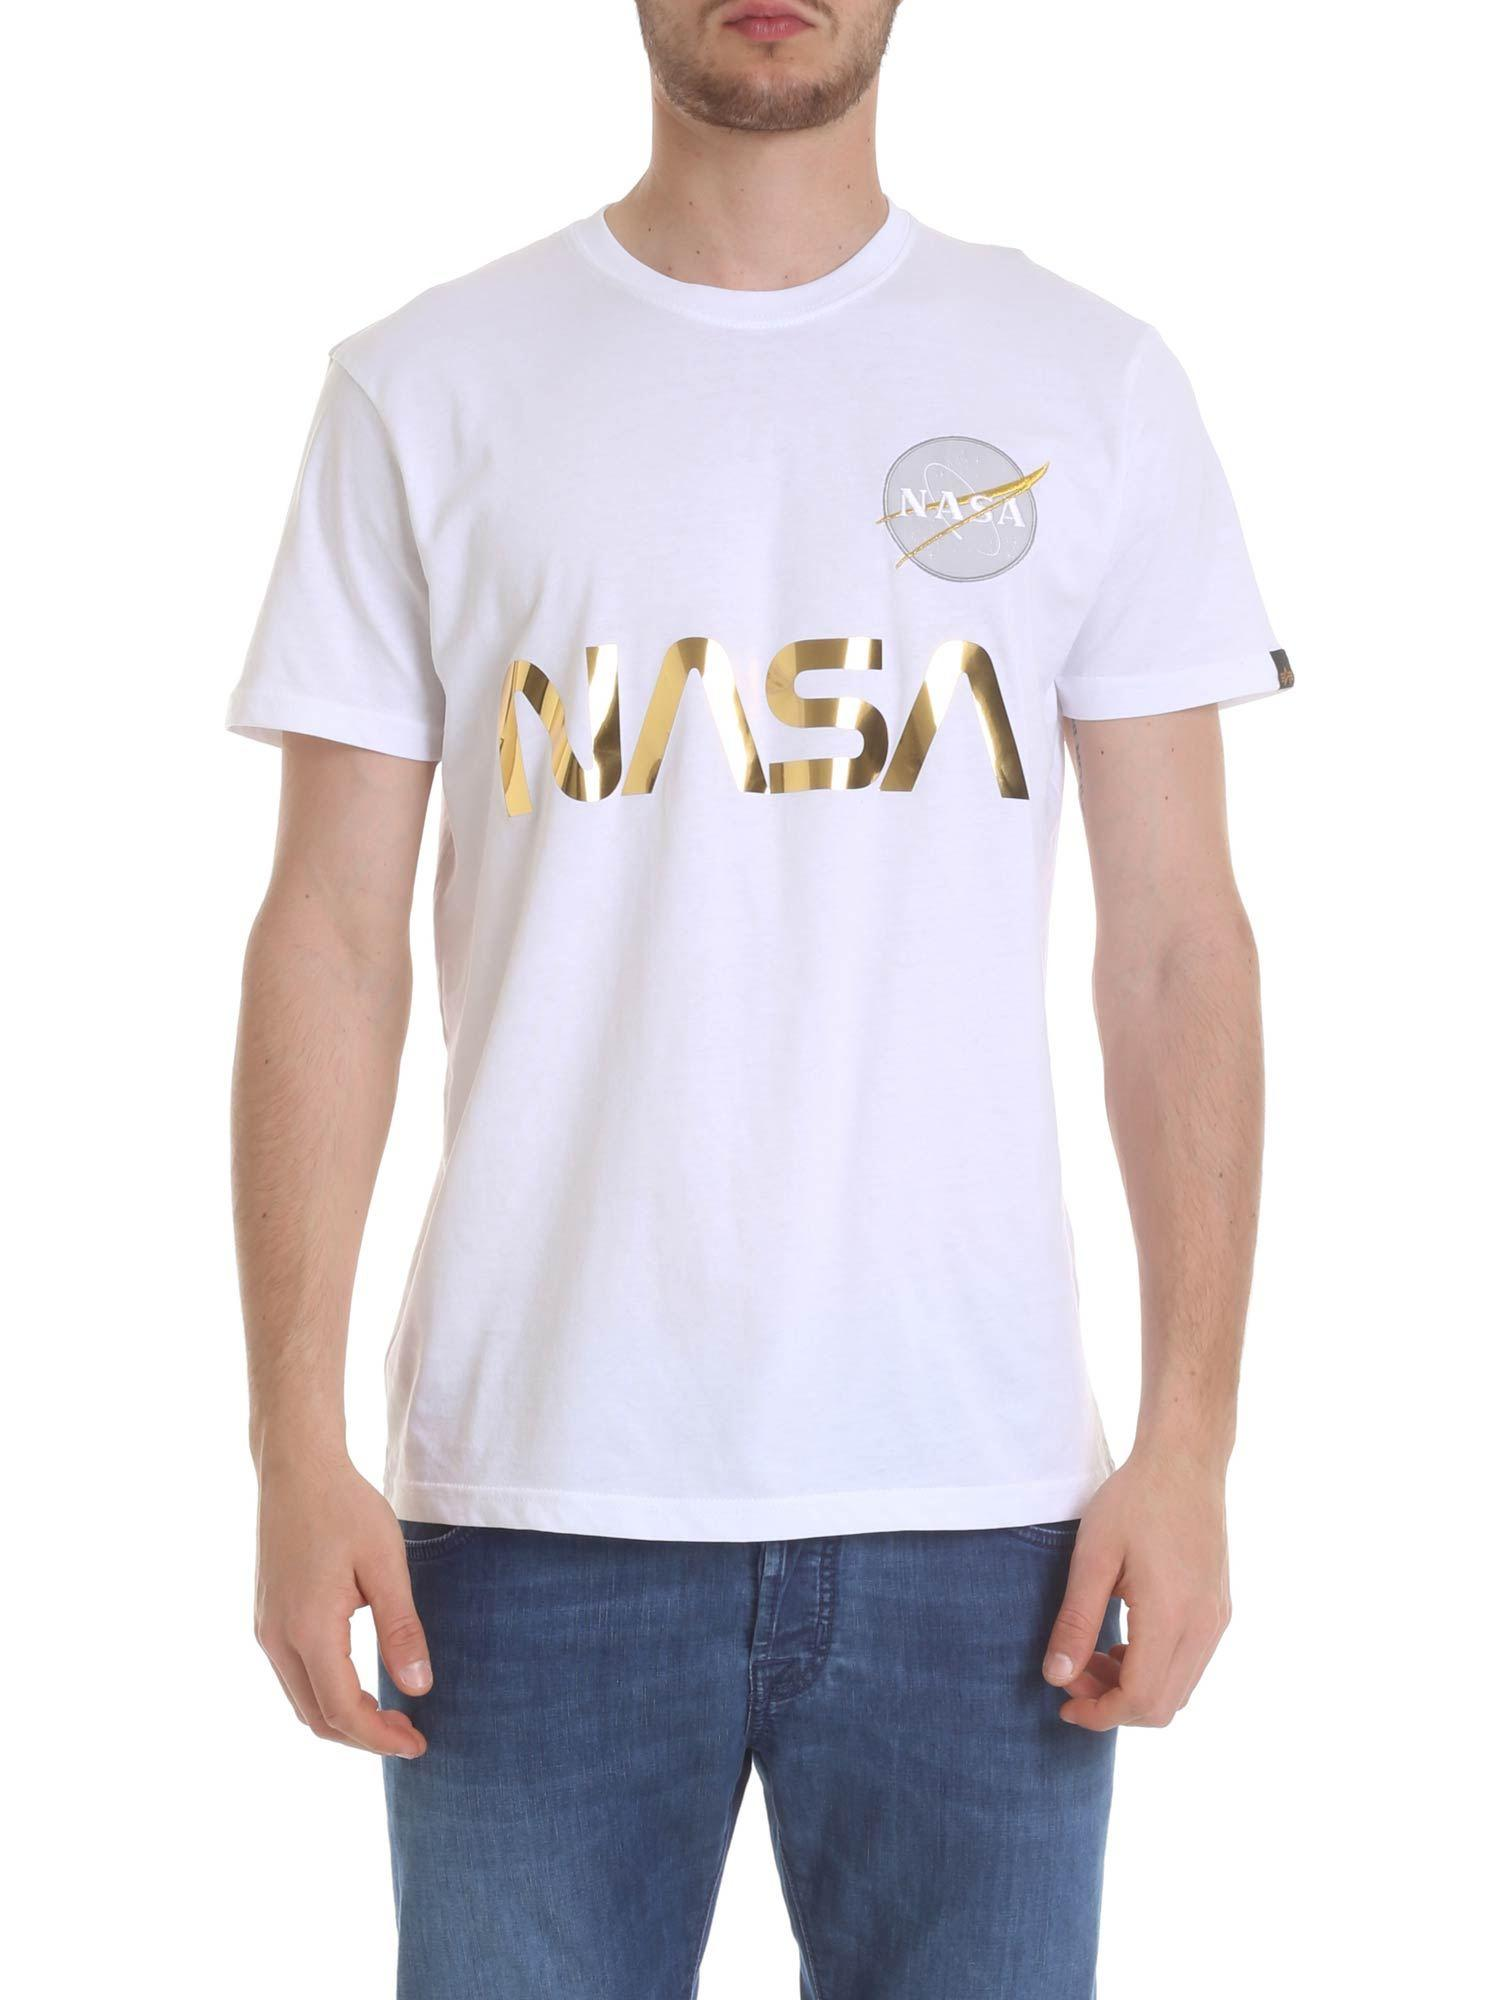 e87ad6c3 Alpha Industries Nasa Reflectivex T-shirt In White in White for Men ...